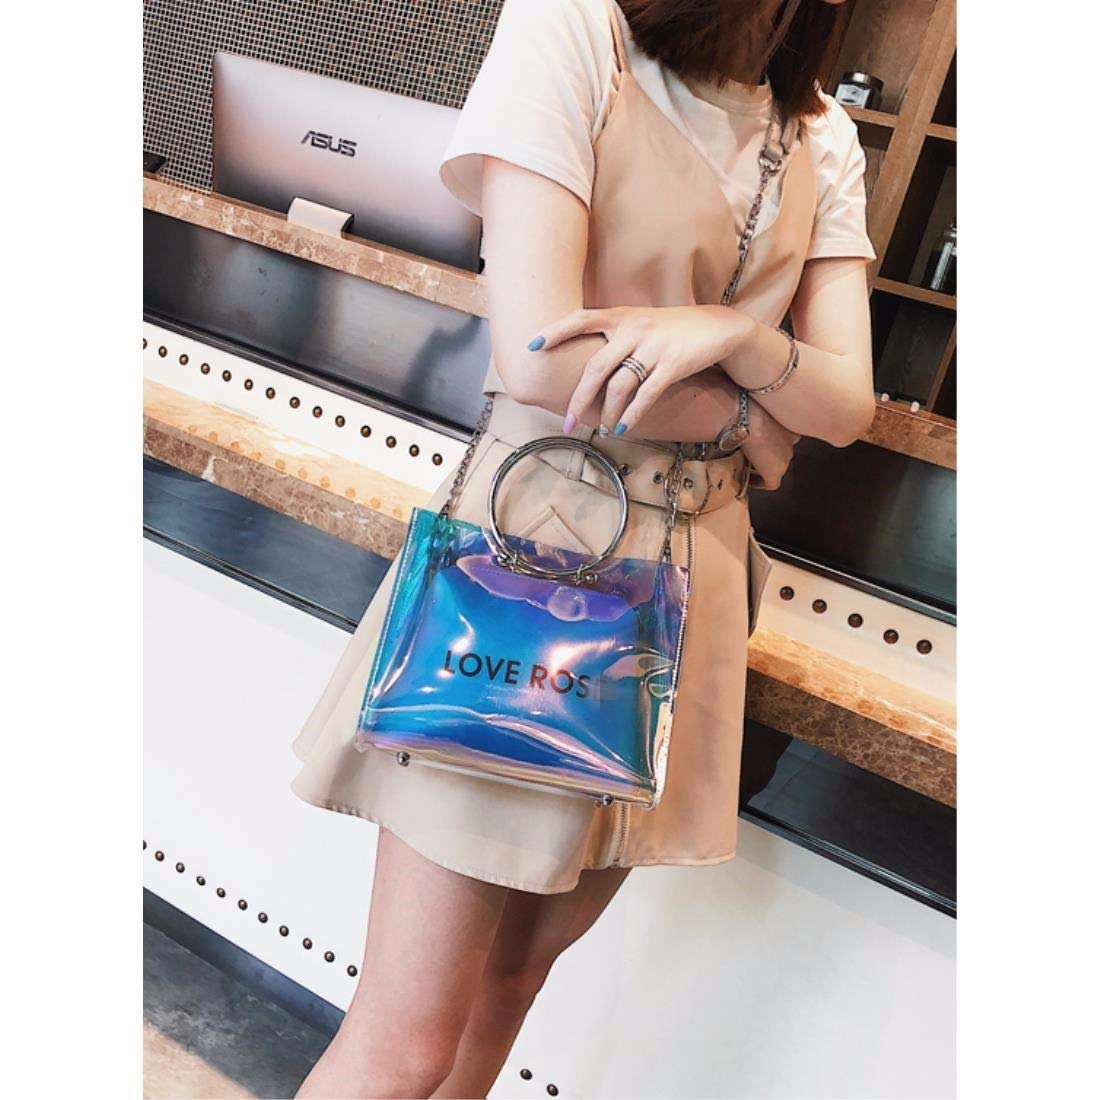 ERLINGSAN-XKB Weibliche Tasche Transparente Tasche Sommer Crossbody Beutel Beutel Beutel Kette Candy Bag B07GXL42RX Umhngetaschen Angenehmes Aussehen 45023a